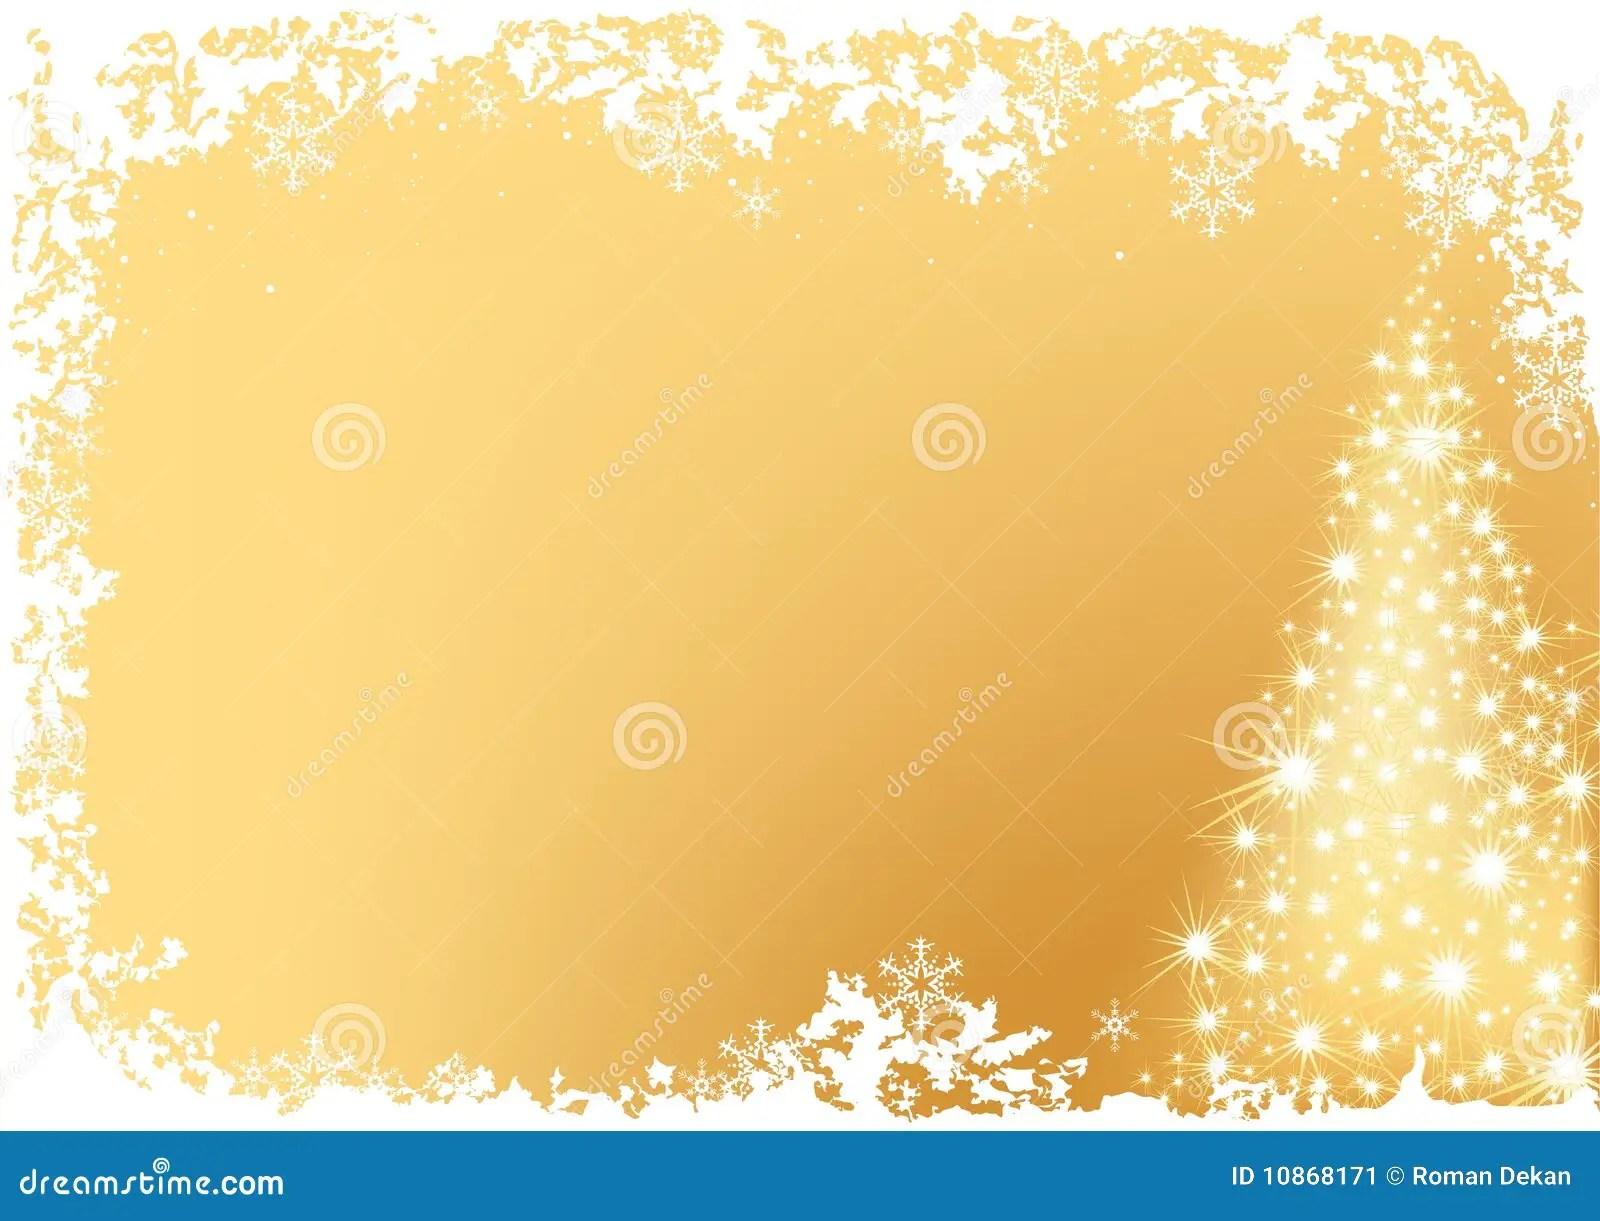 Golden Abstract Christmas Tree Stock Image Image 10868171